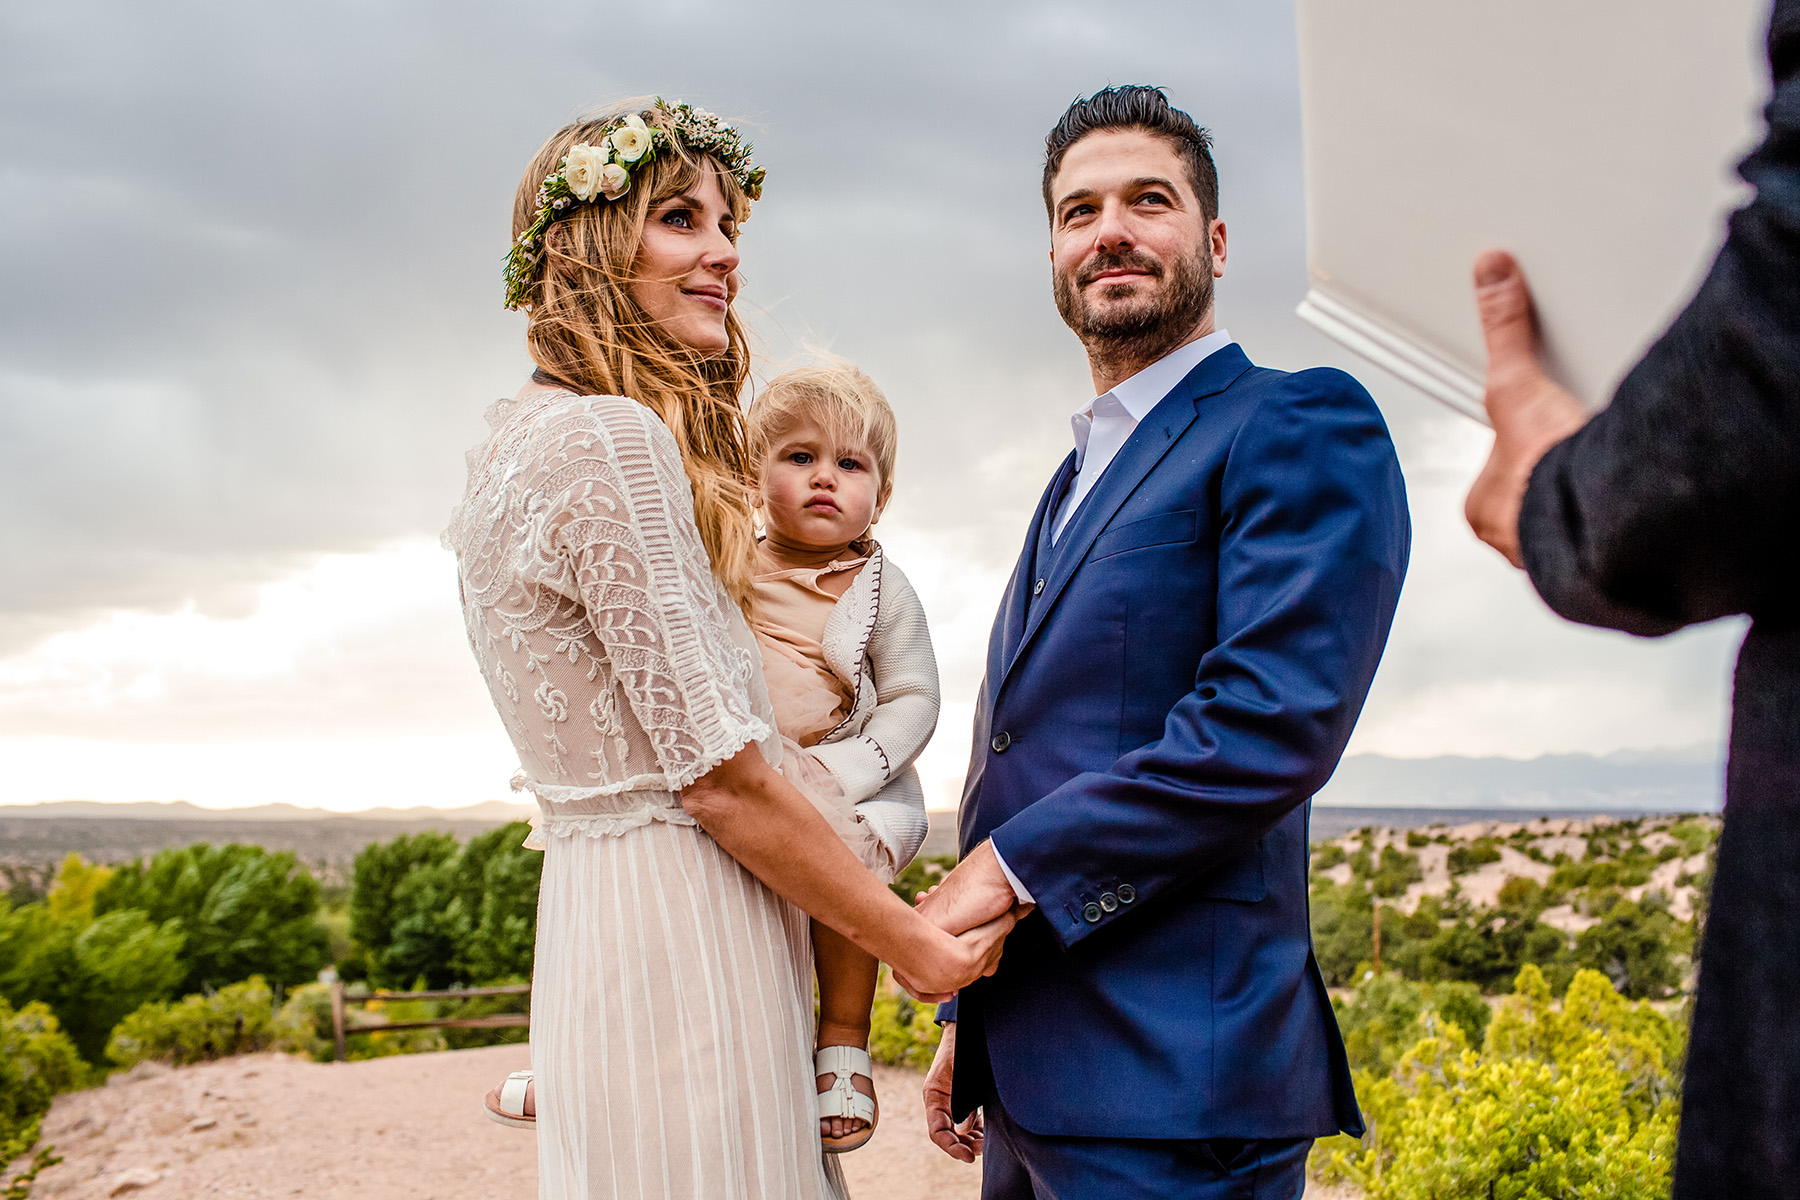 Melinda-Dustin-wedding-four-seasons-resort-santa-fe-new-mexico-1005